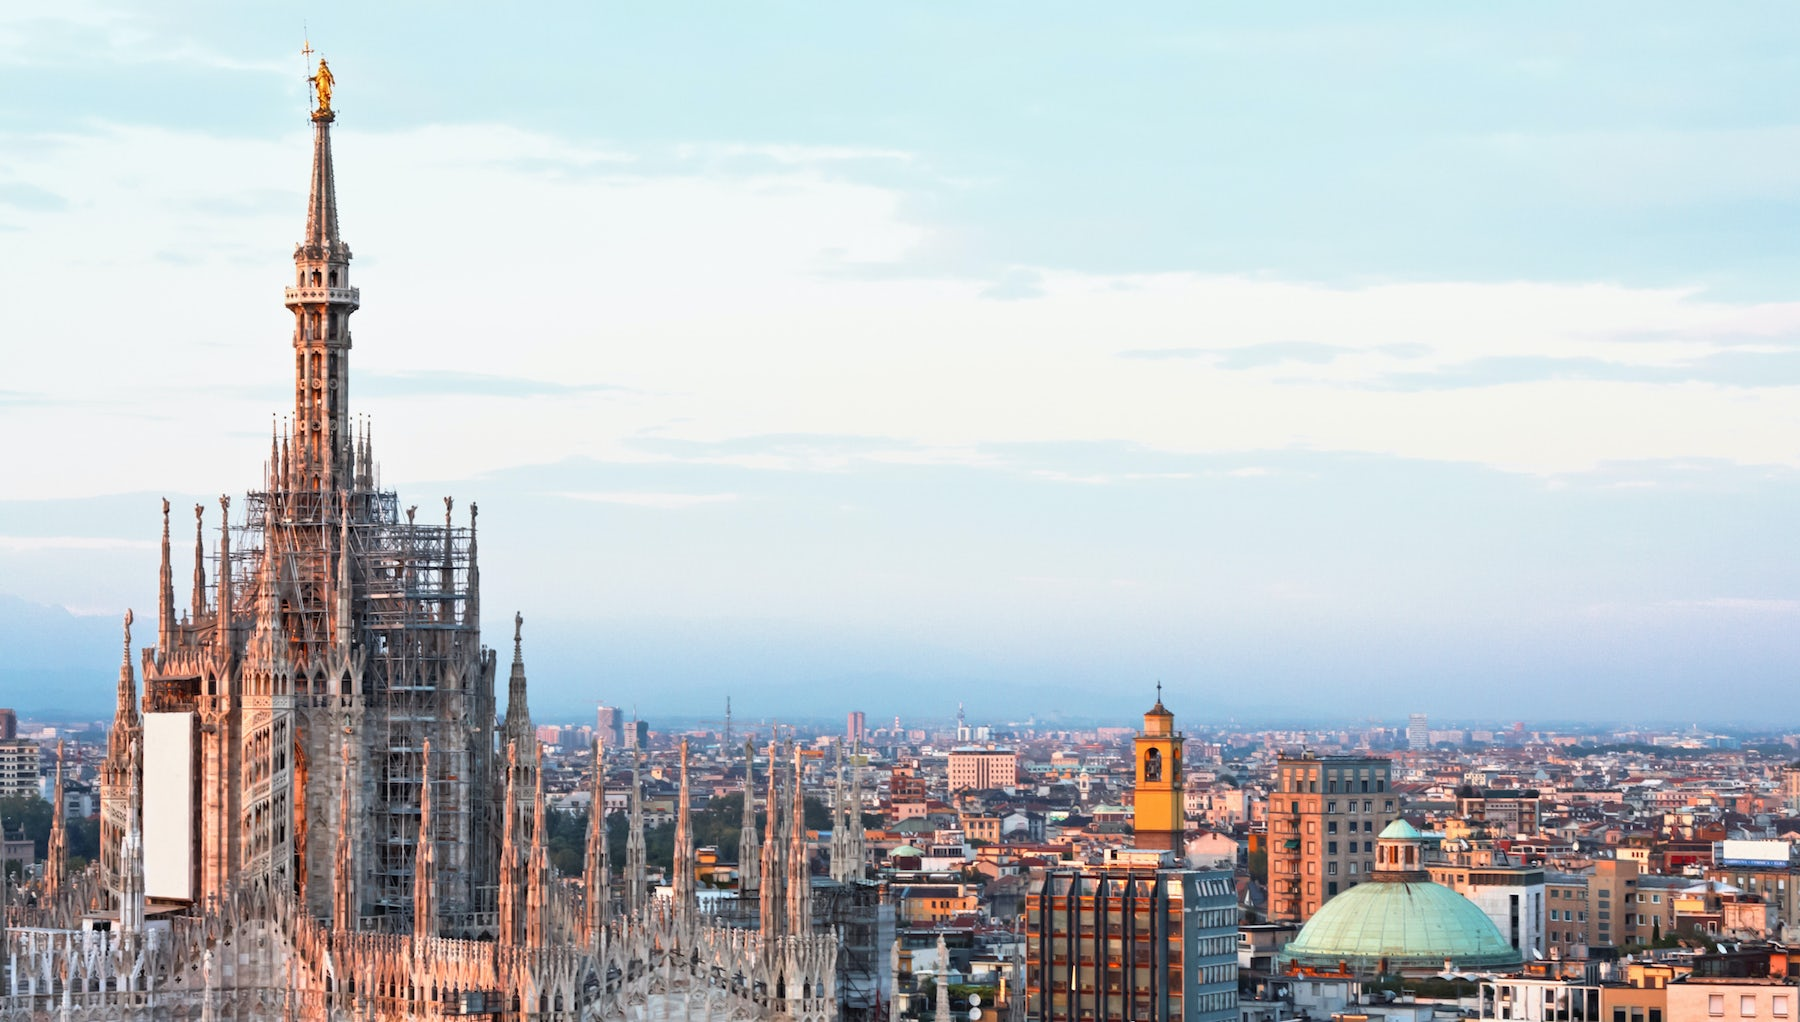 Milan | Source: Shutterstock